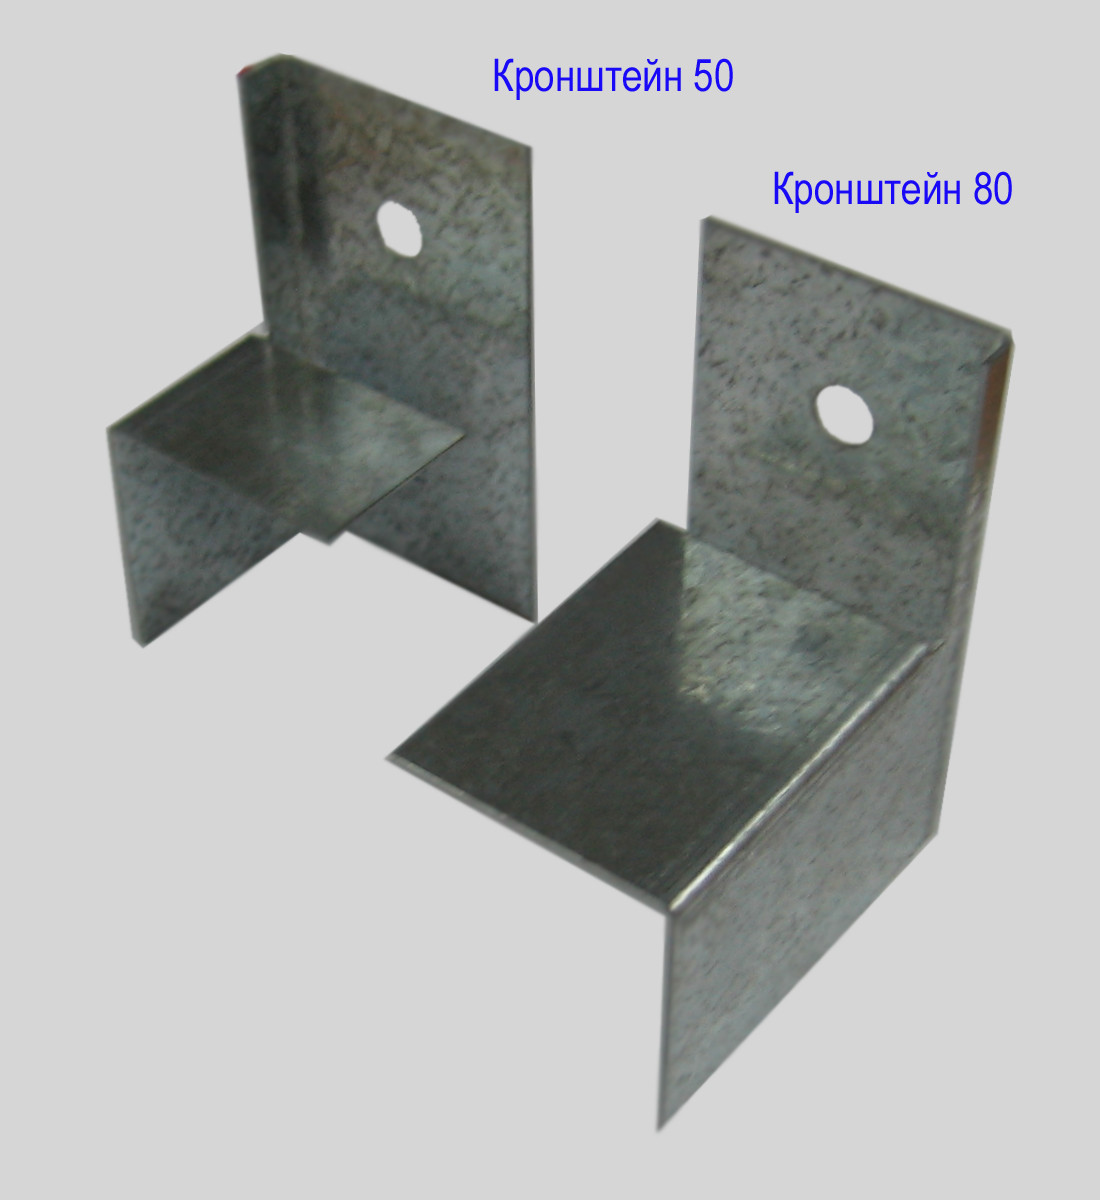 Кронштейн оцинкованный КР-150, тол. 1,4 мм